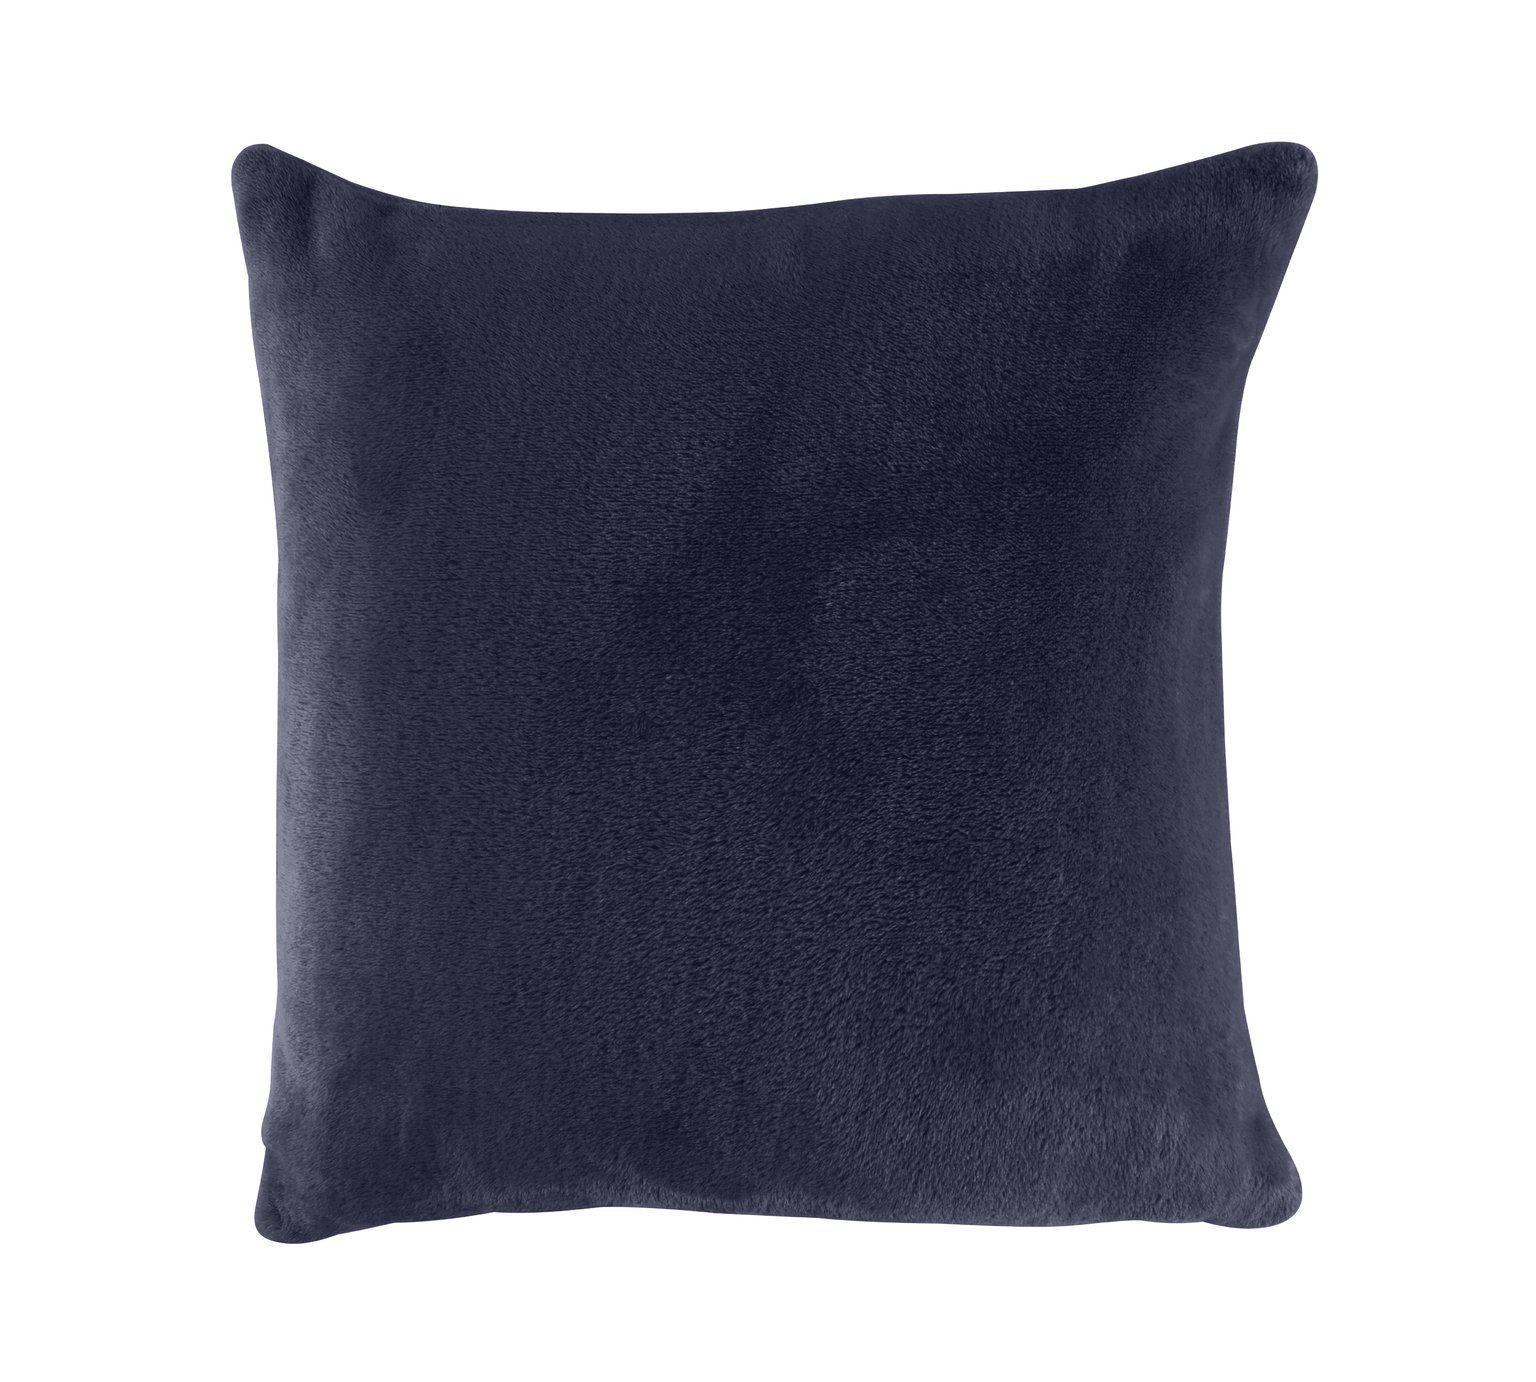 Buy Argos Home Supersoft Cushion Navy Cushions Argos